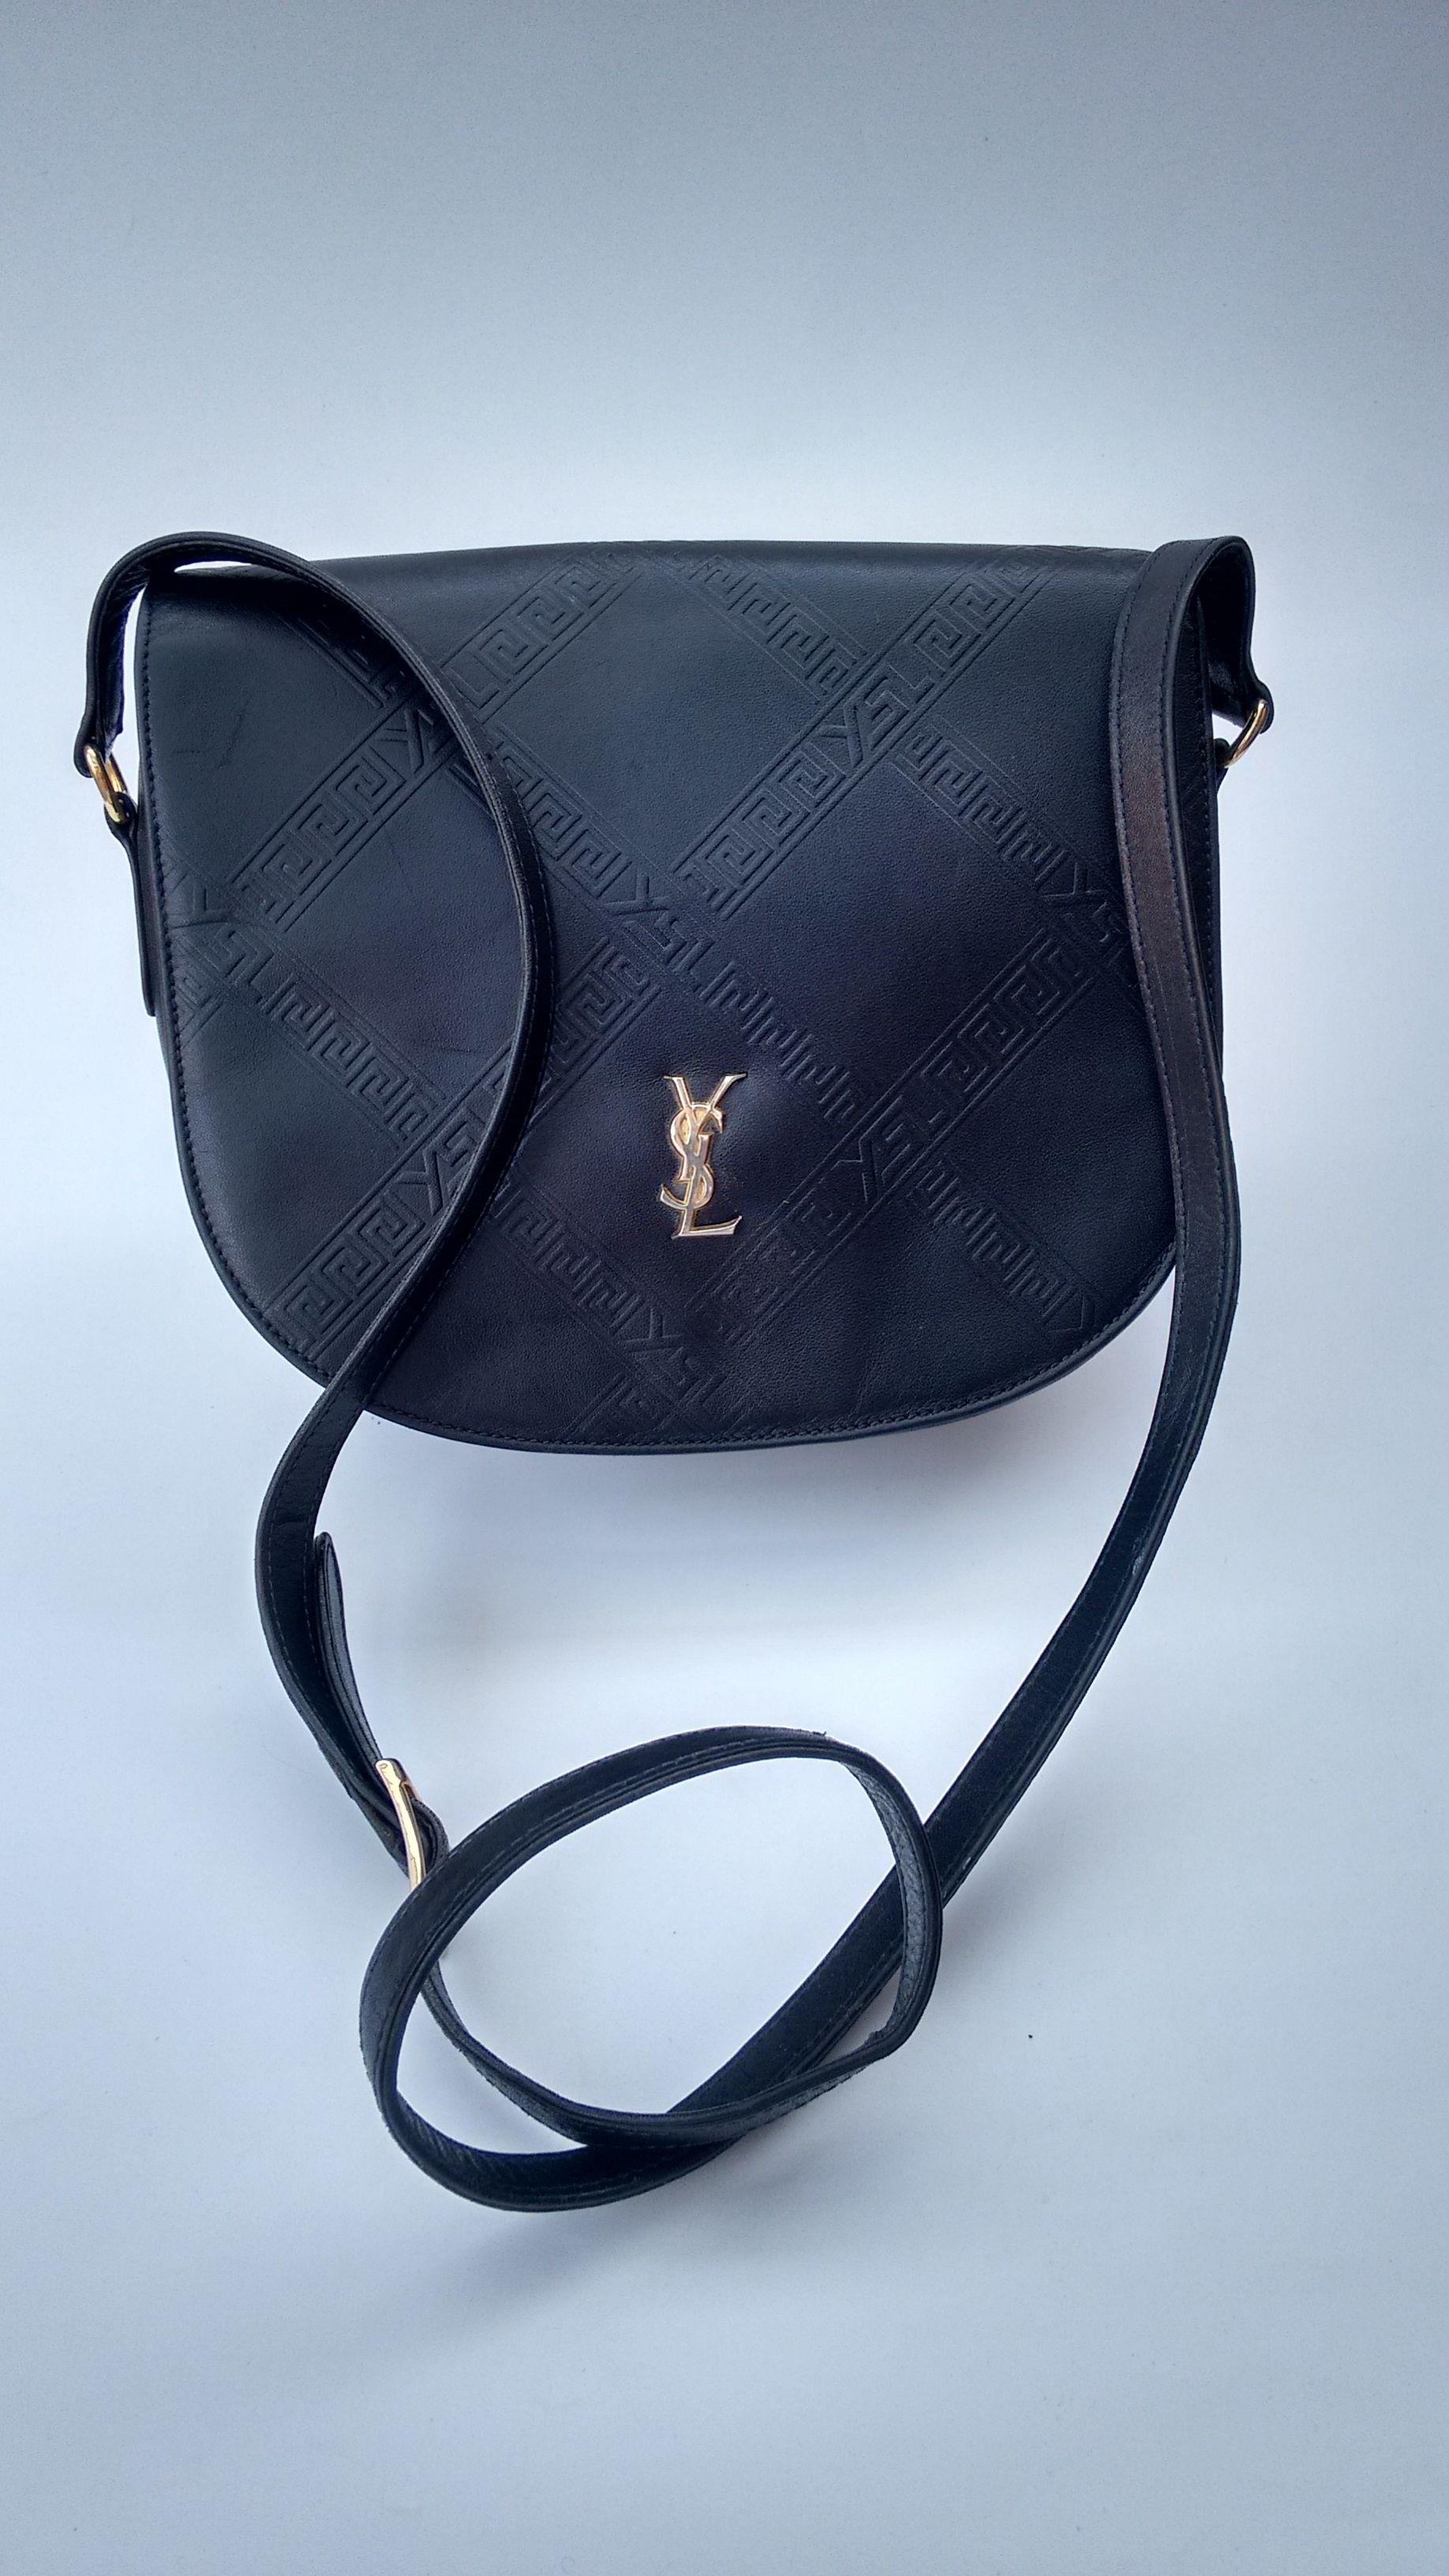 2959dfc29ed YSL Bag. Yves Saint Laurent Vintage Navy / Dark Blue and White Leather  Shoulder / Crossbody Bag. French designer purse